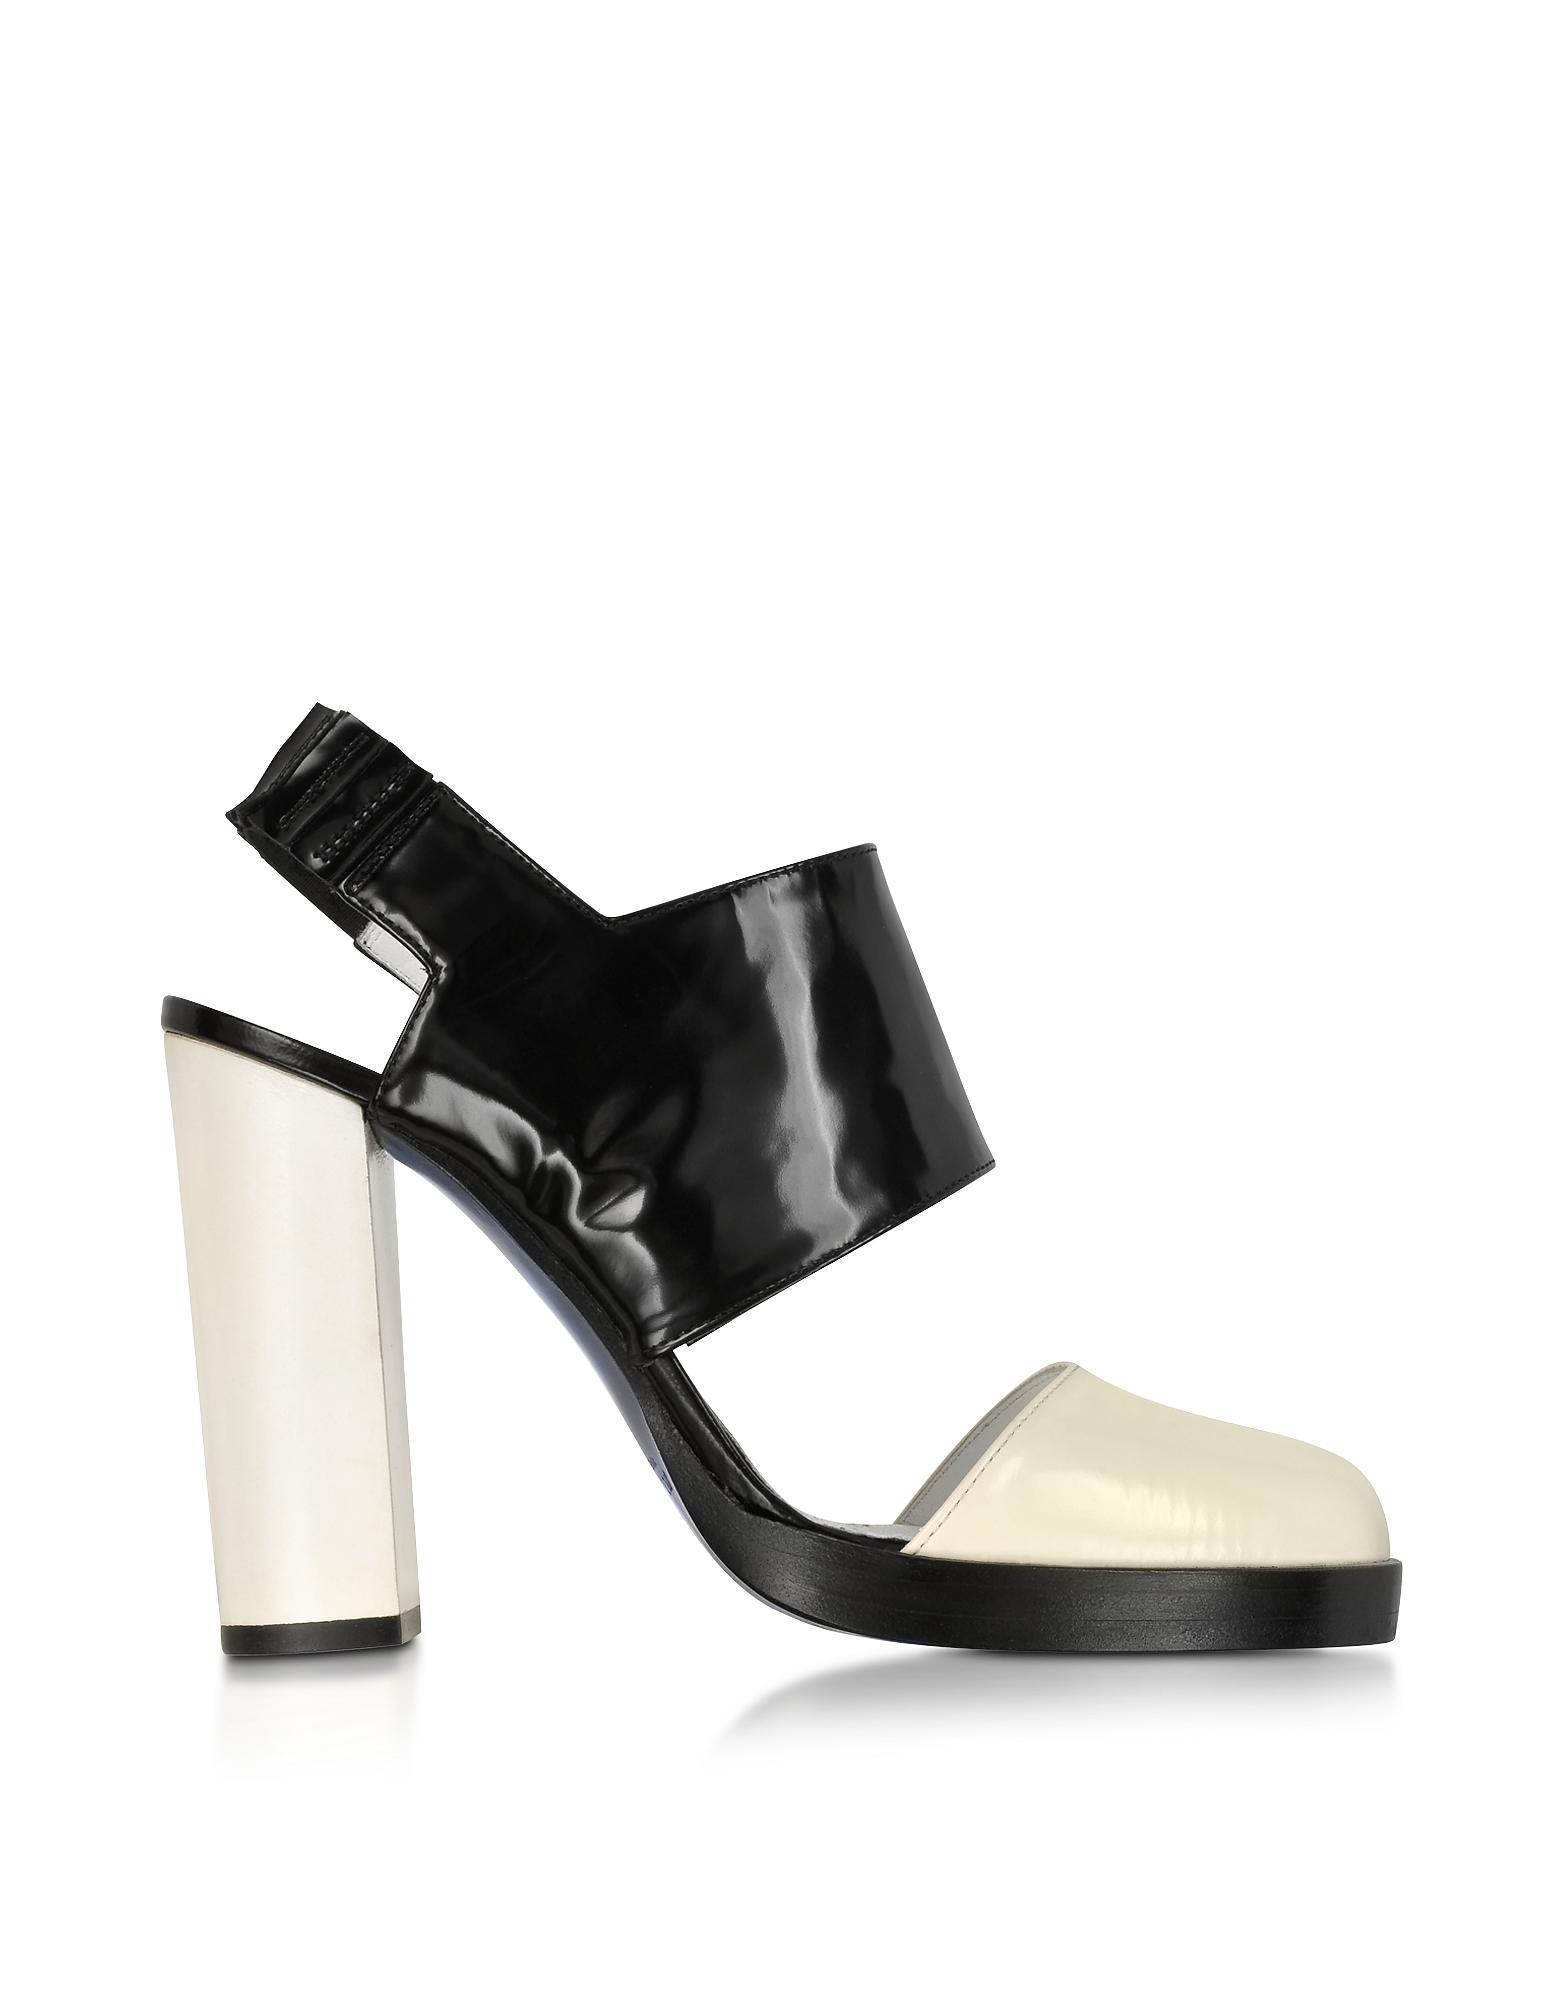 Jil Sander Shoes, Black and Cream High Heel Slingback